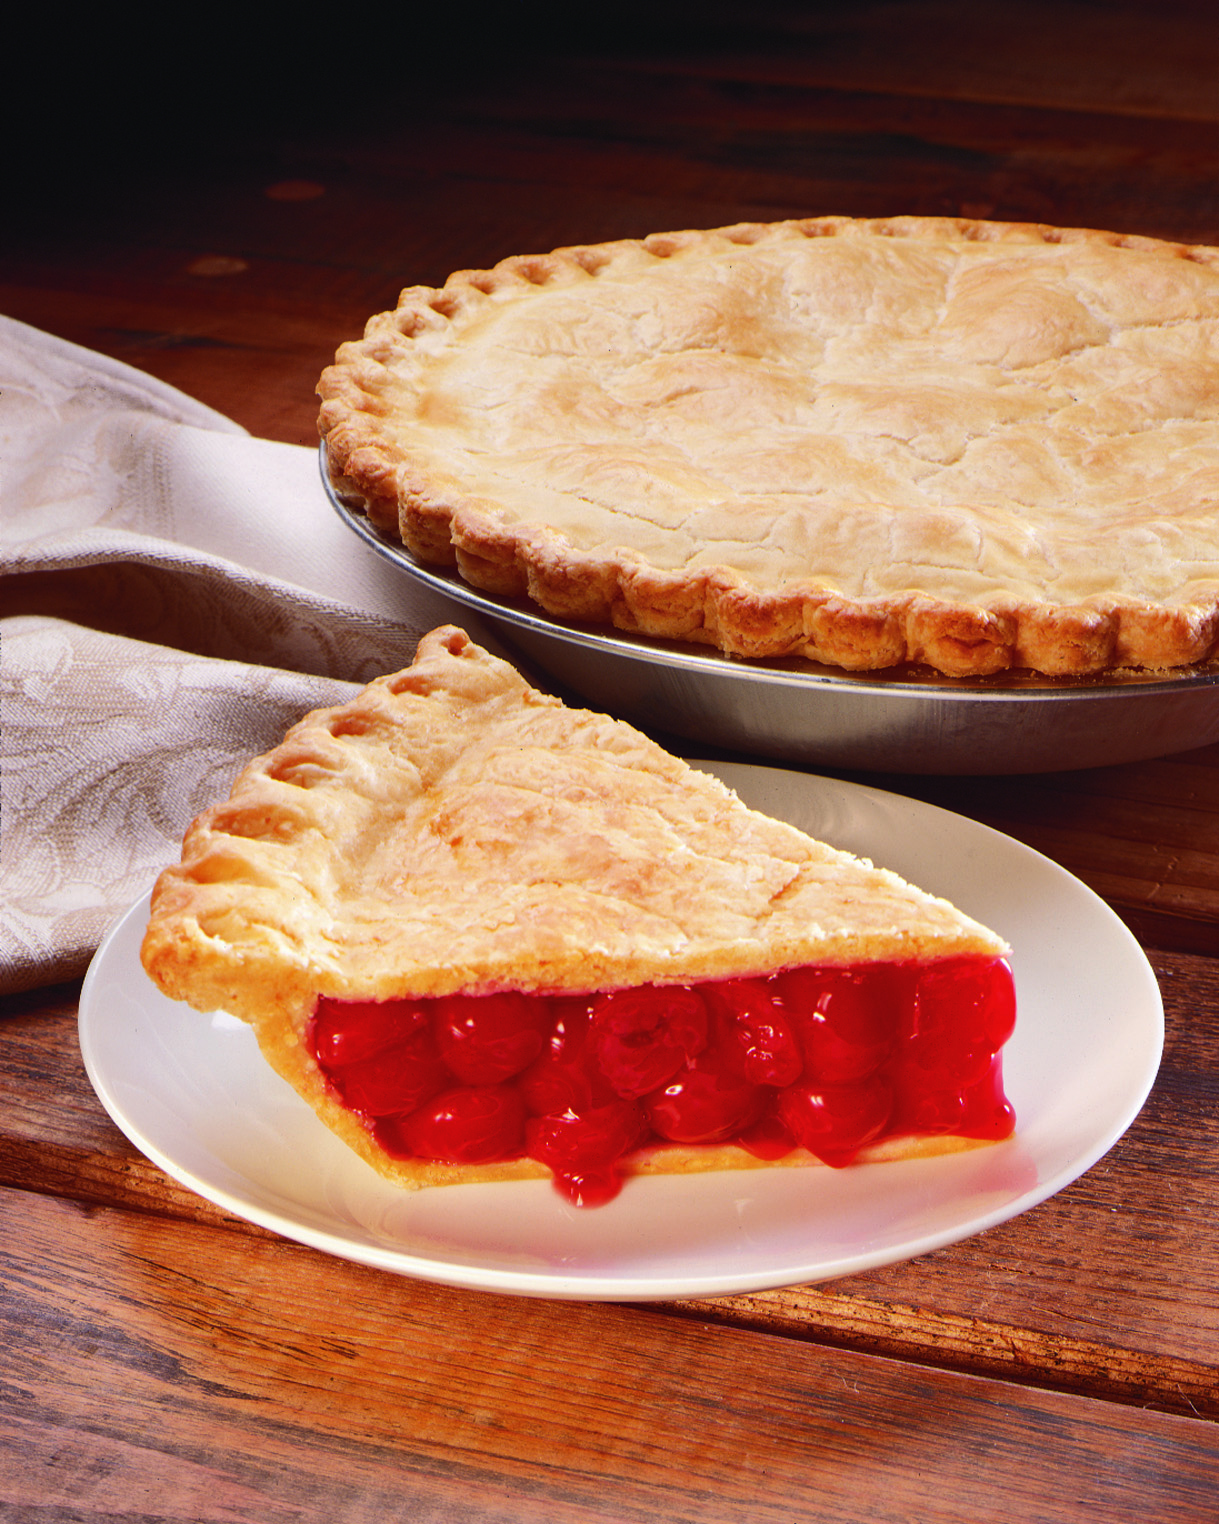 traditonal cherry pie